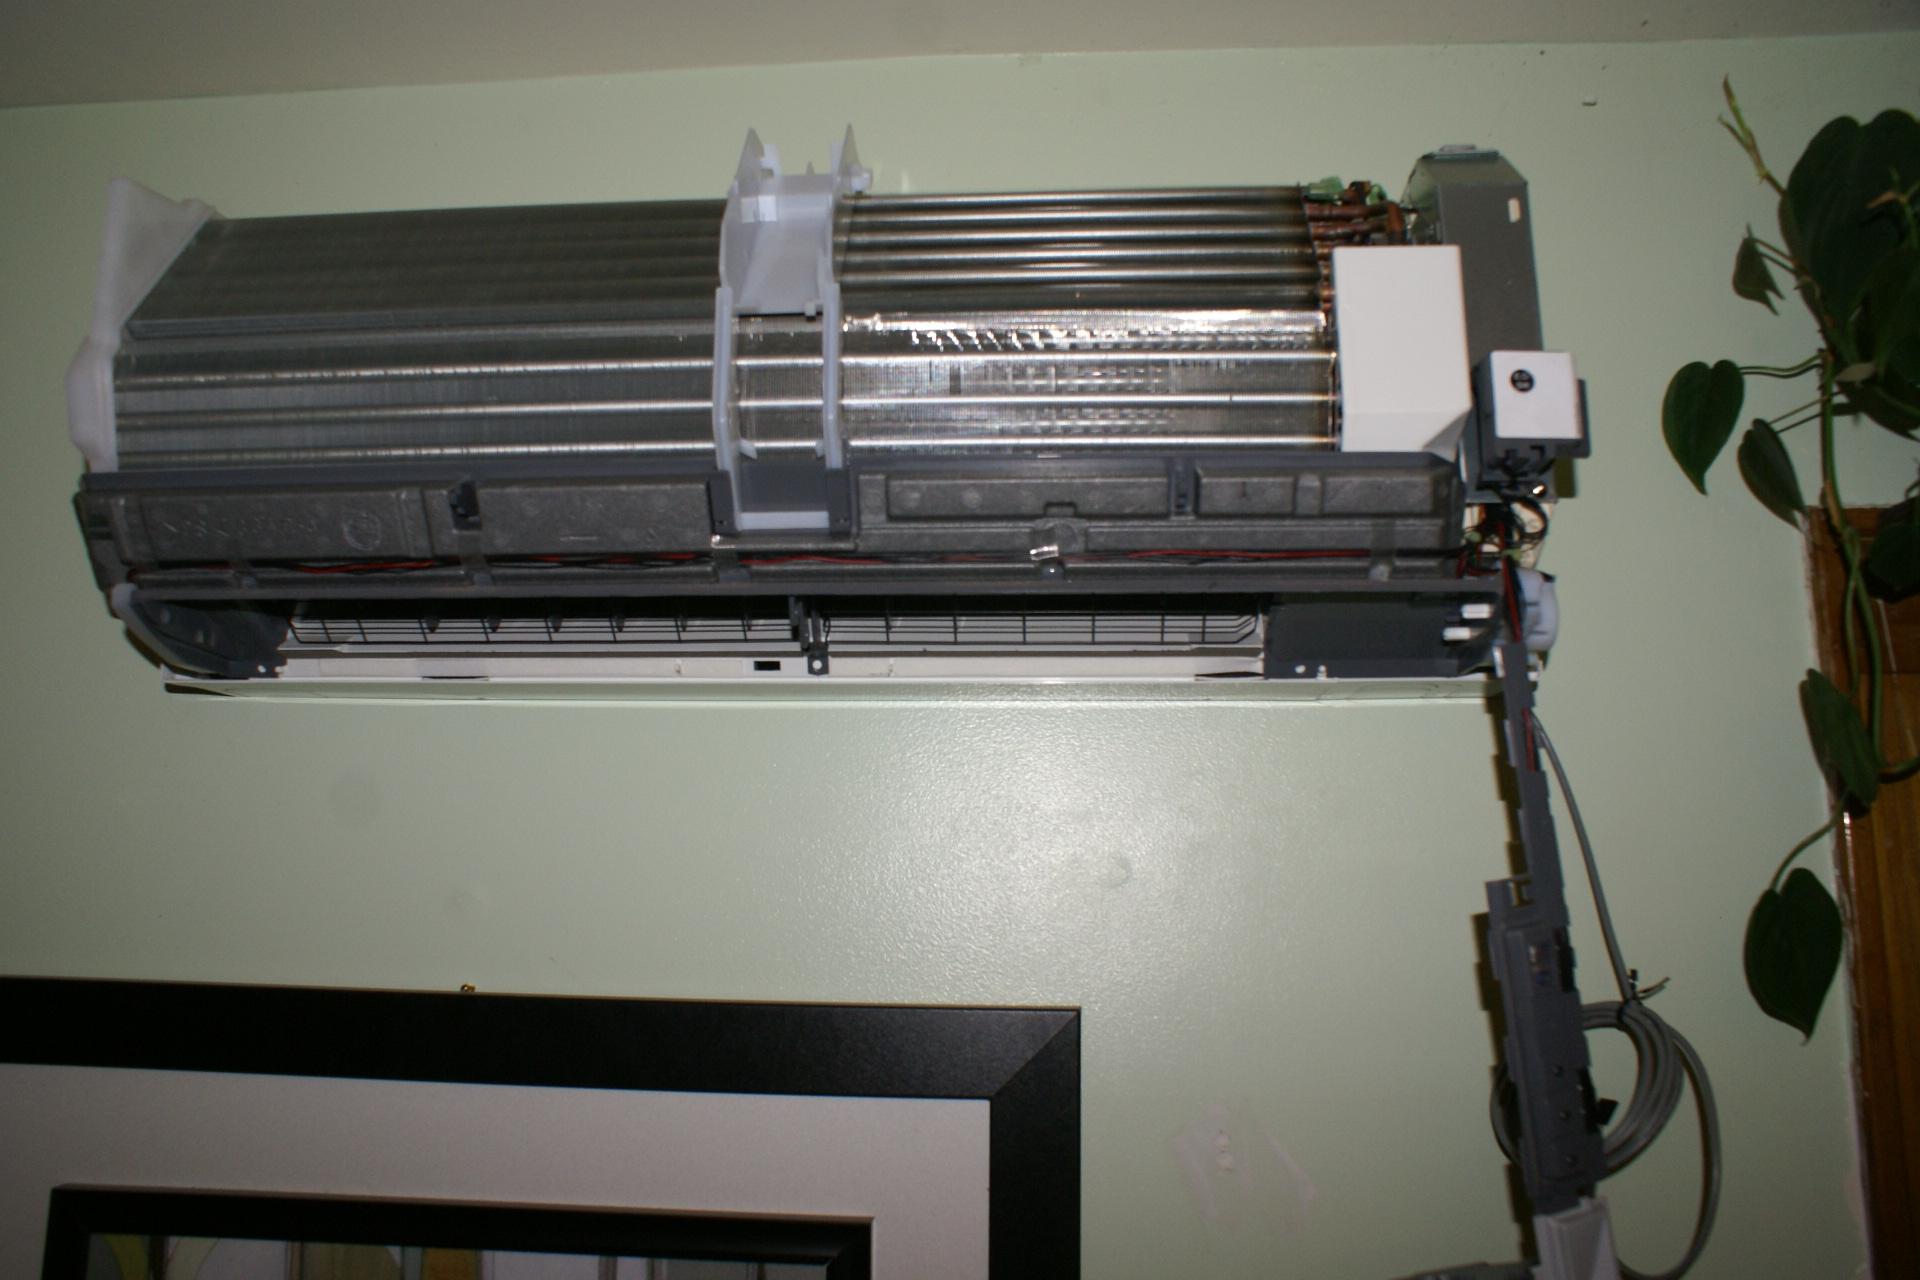 mitsubishi split ac unit wiring diagram 2016 dodge ram 1500 radio adding a programmable thermostat to mr slim